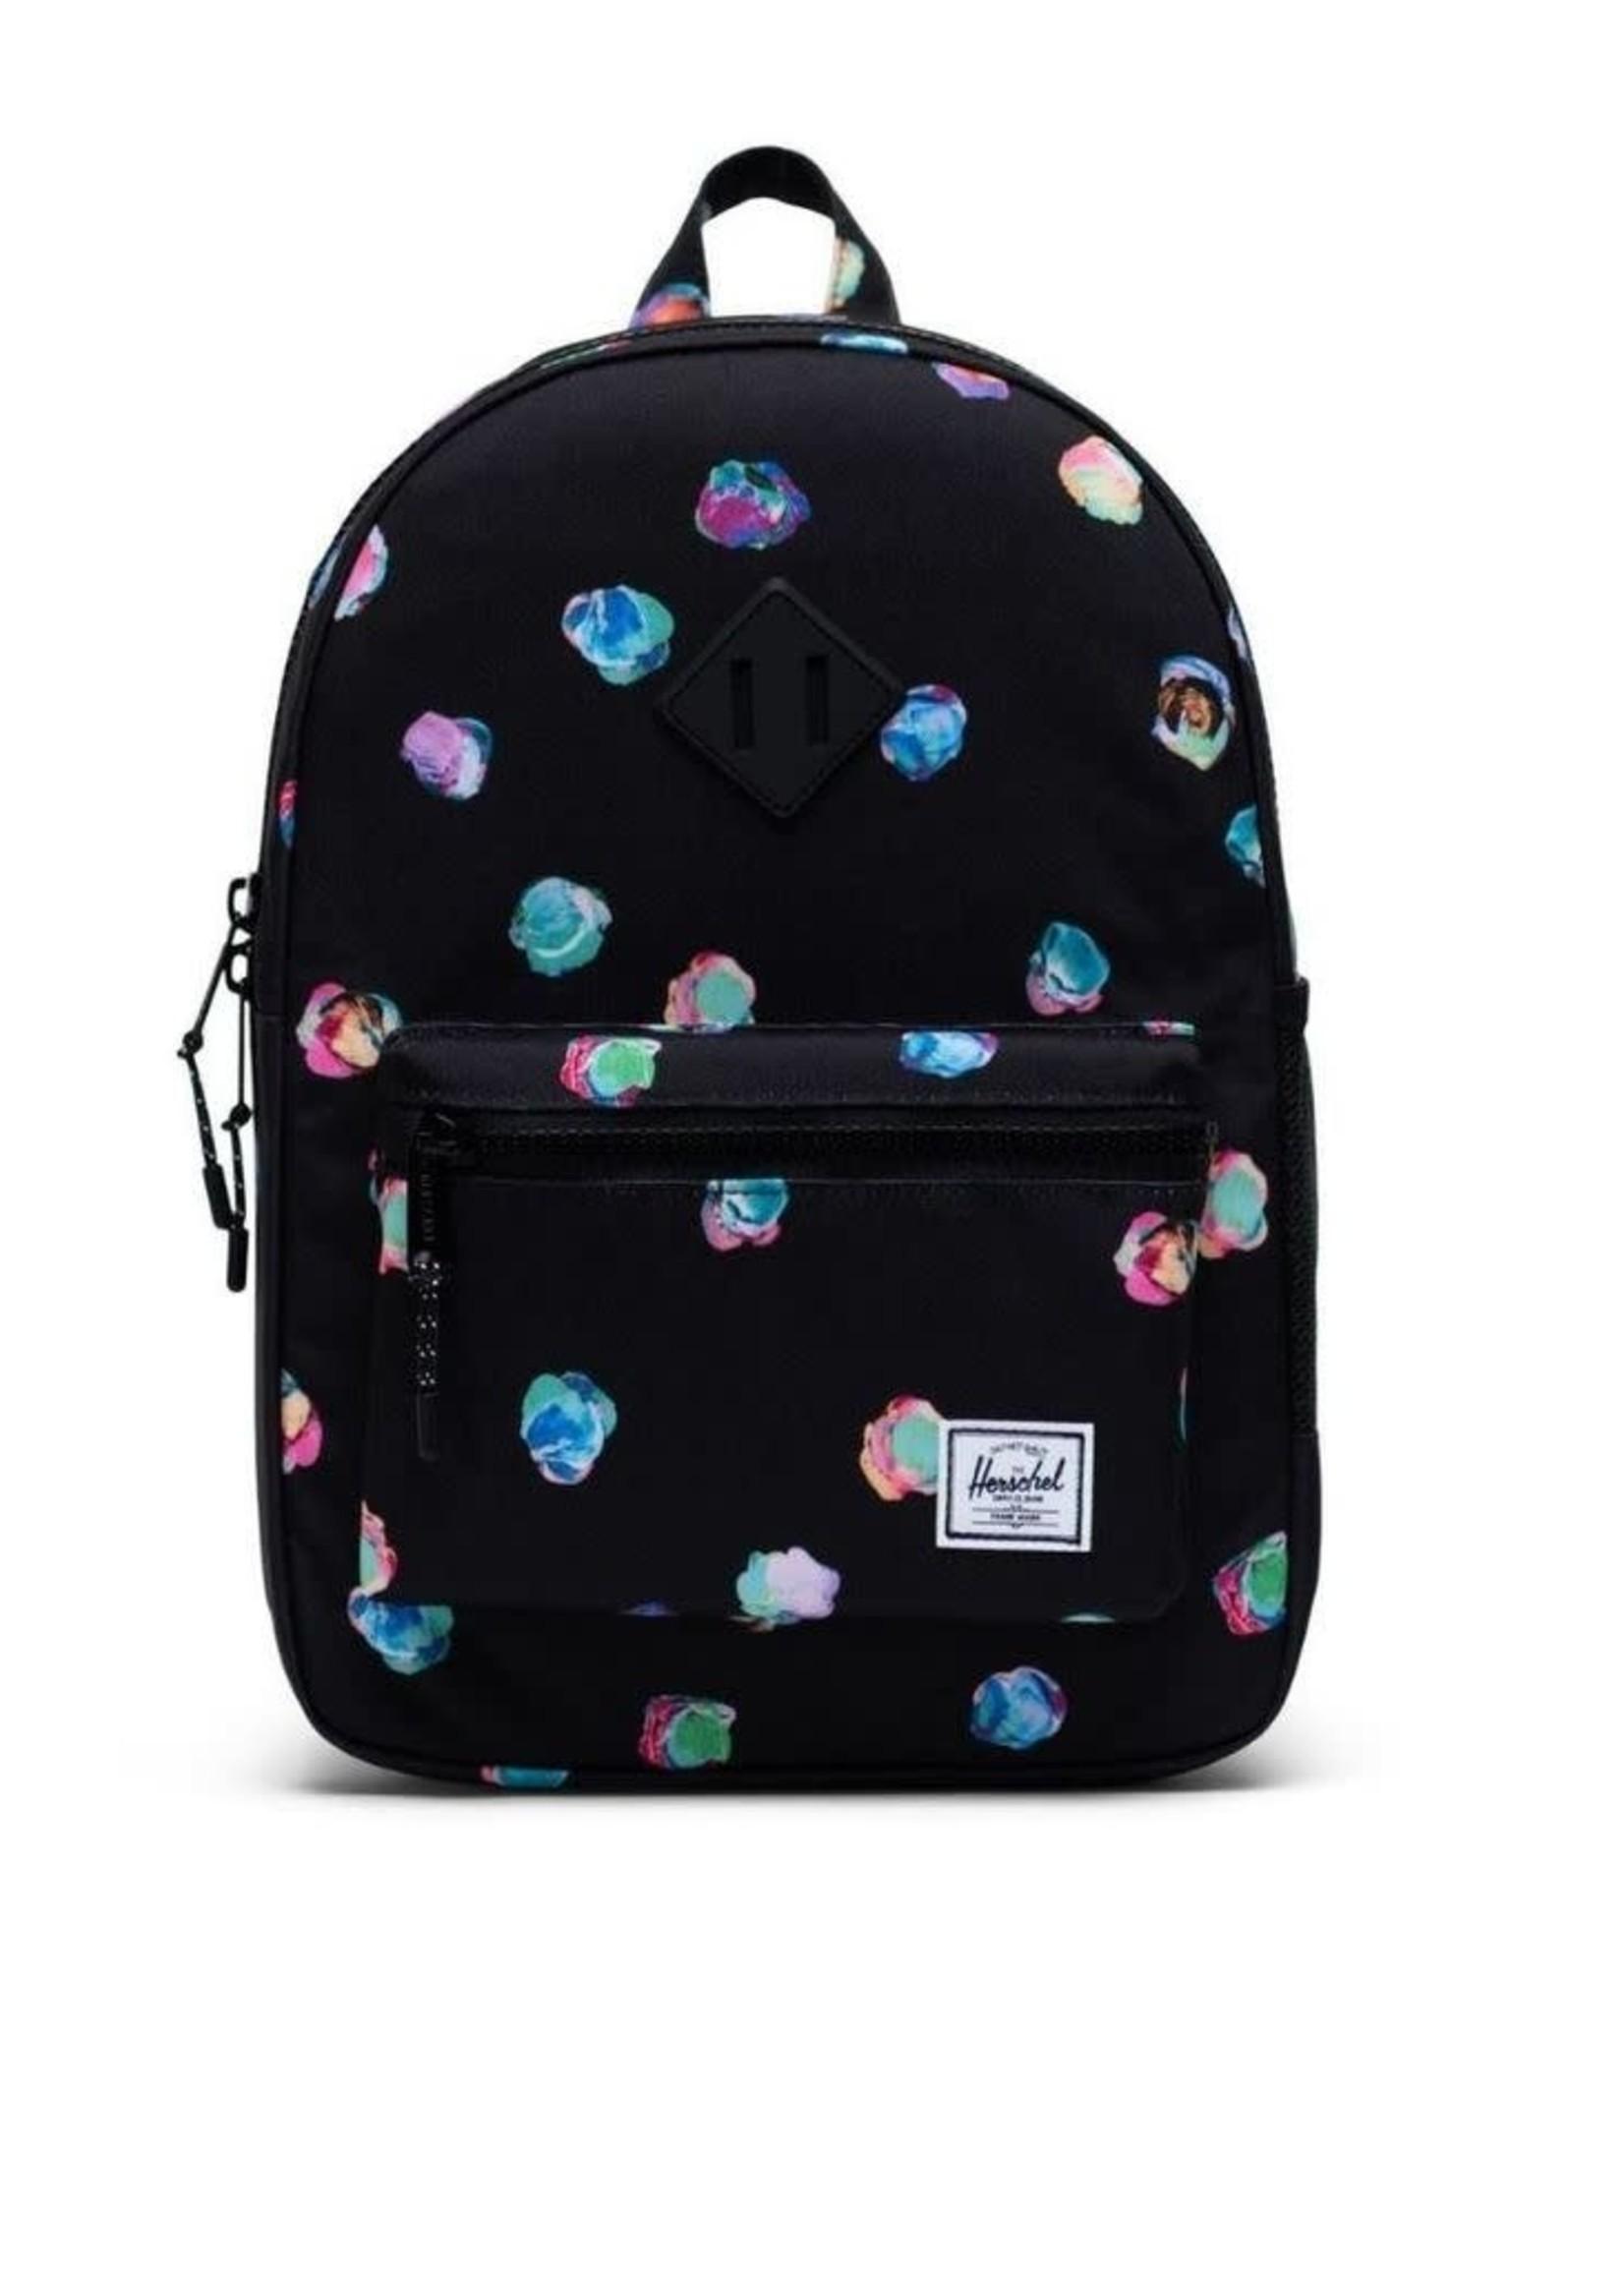 Herschel Supply Herschel Youth Backpack Paint Dot